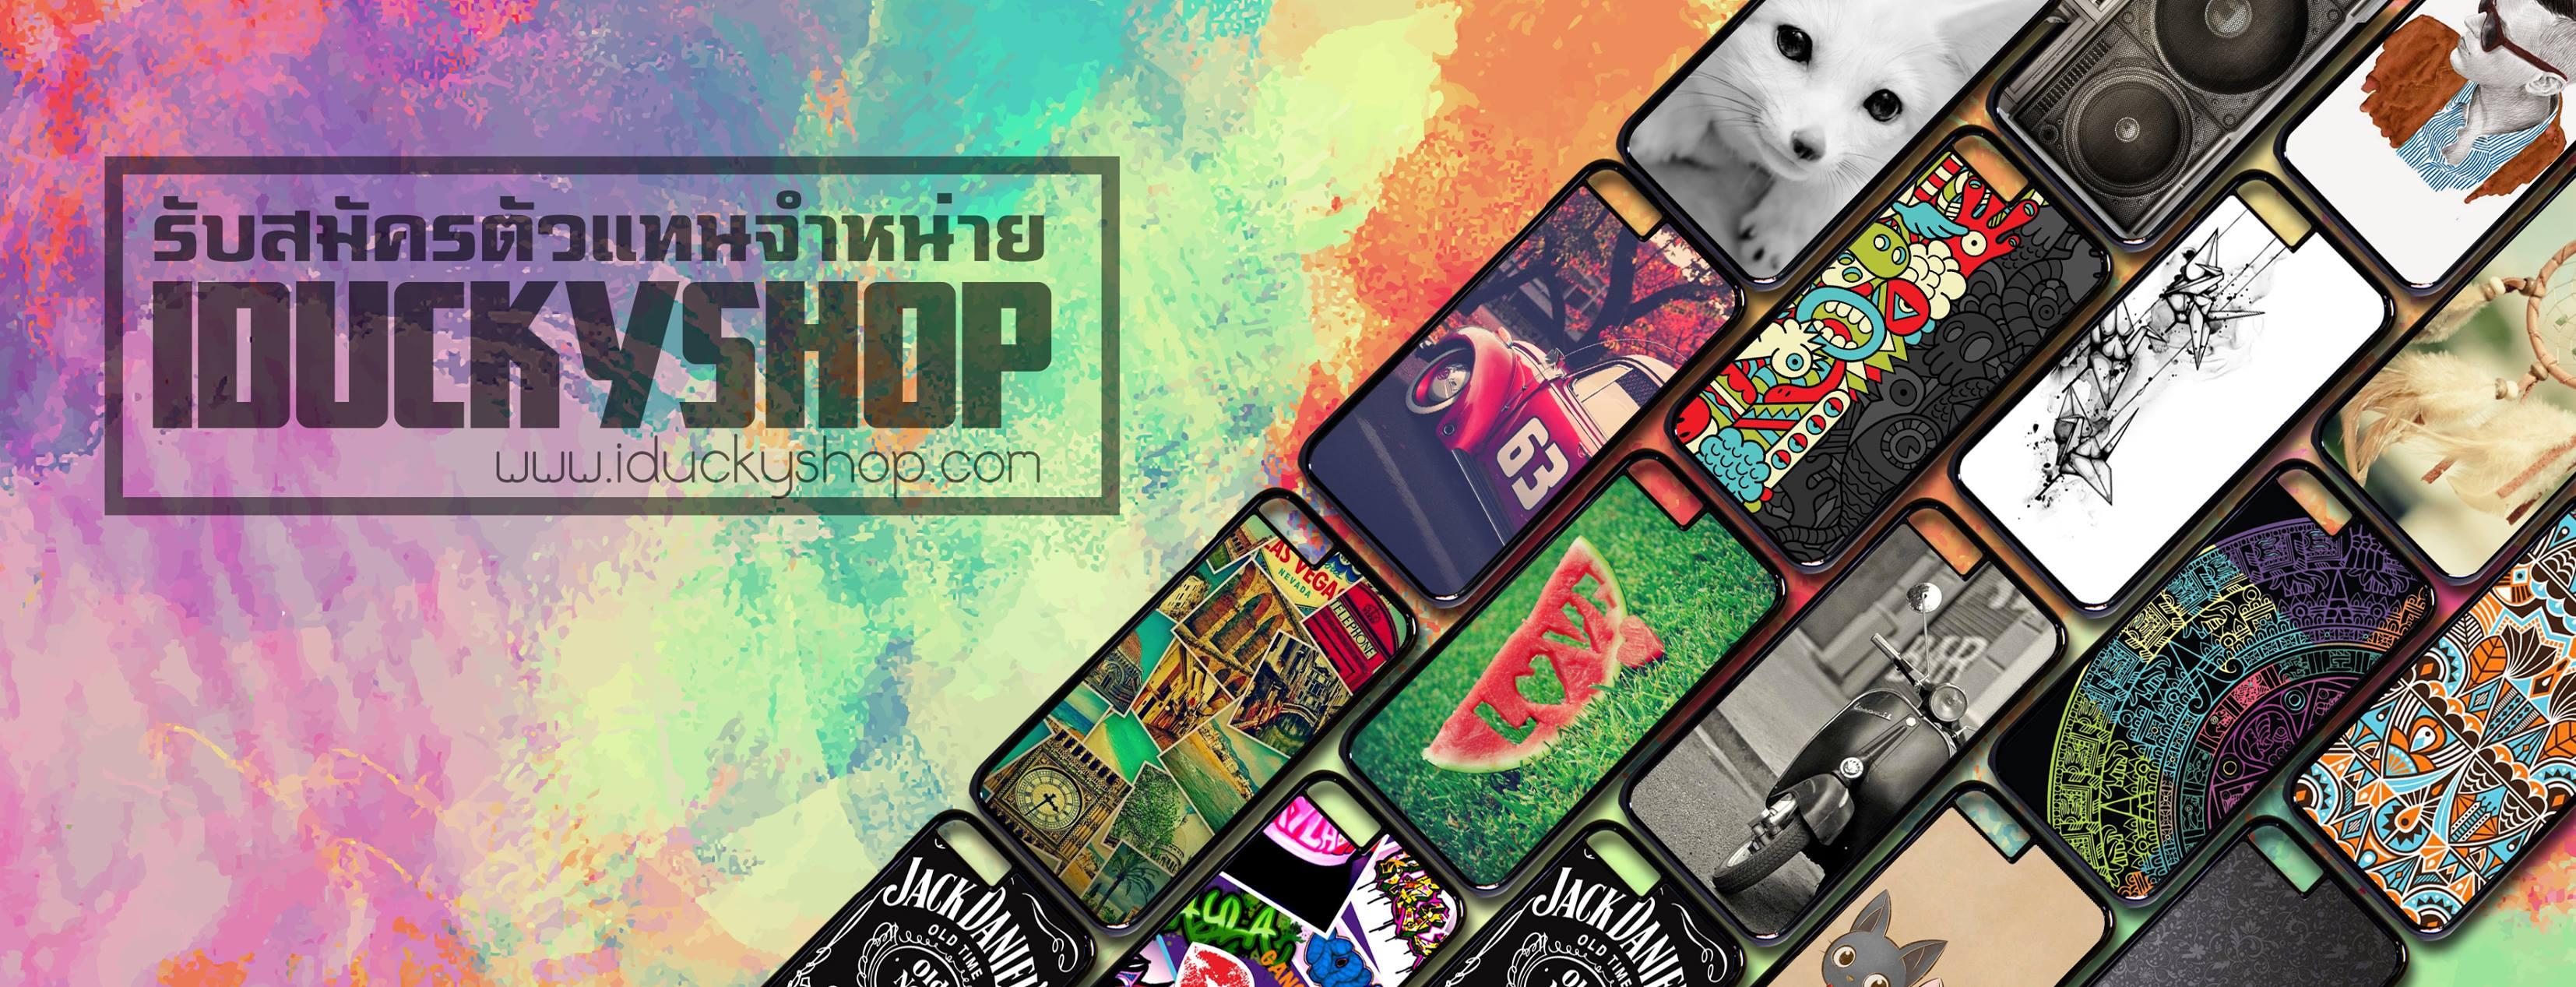 iDucky Shop